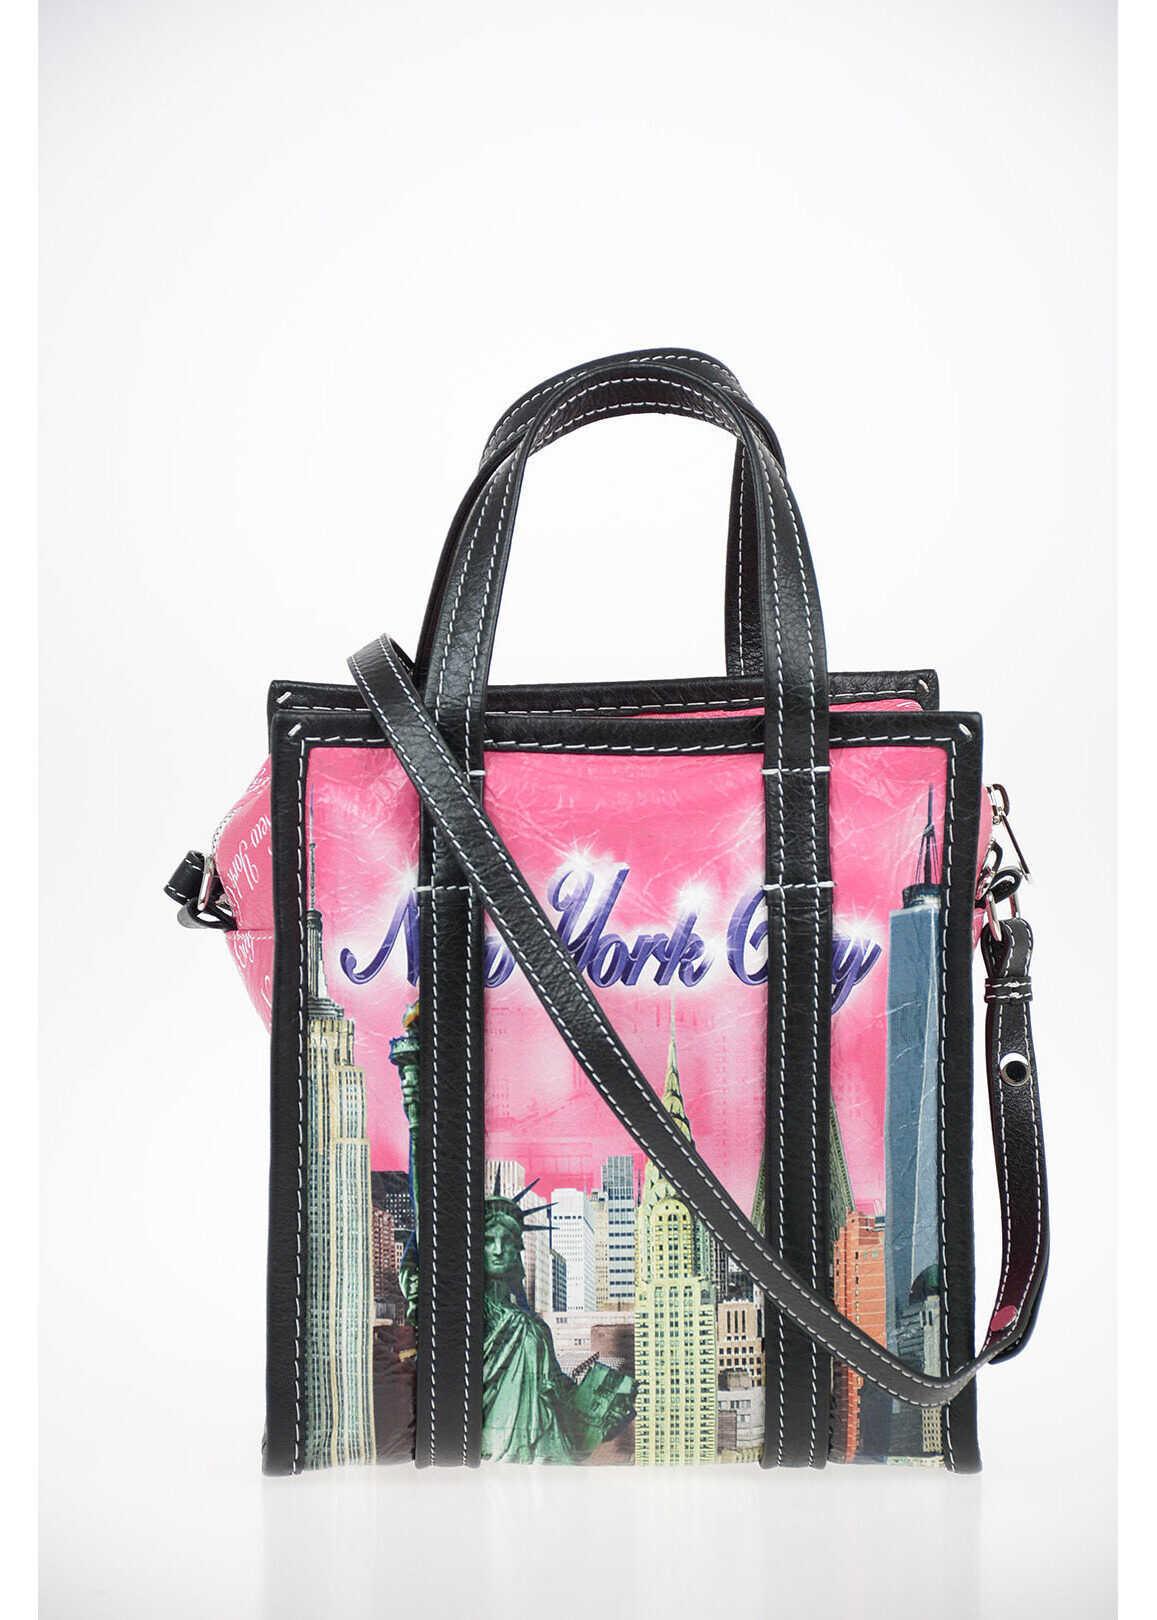 Balenciaga leather BAZAR NEW YORK Shopper bag PINK imagine b-mall.ro